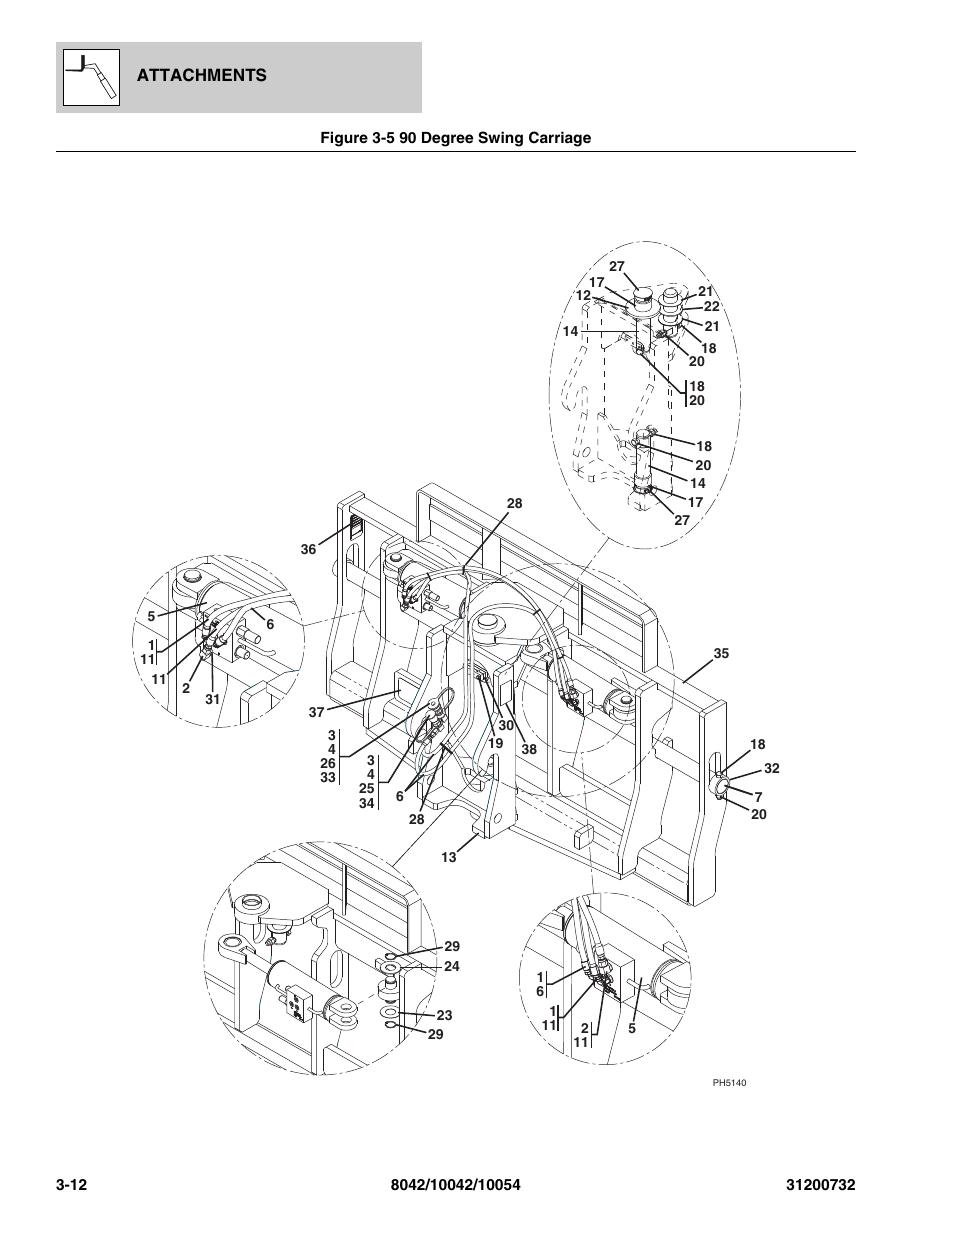 Figure 3-5 90 degree swing carriage, 90 degree swing